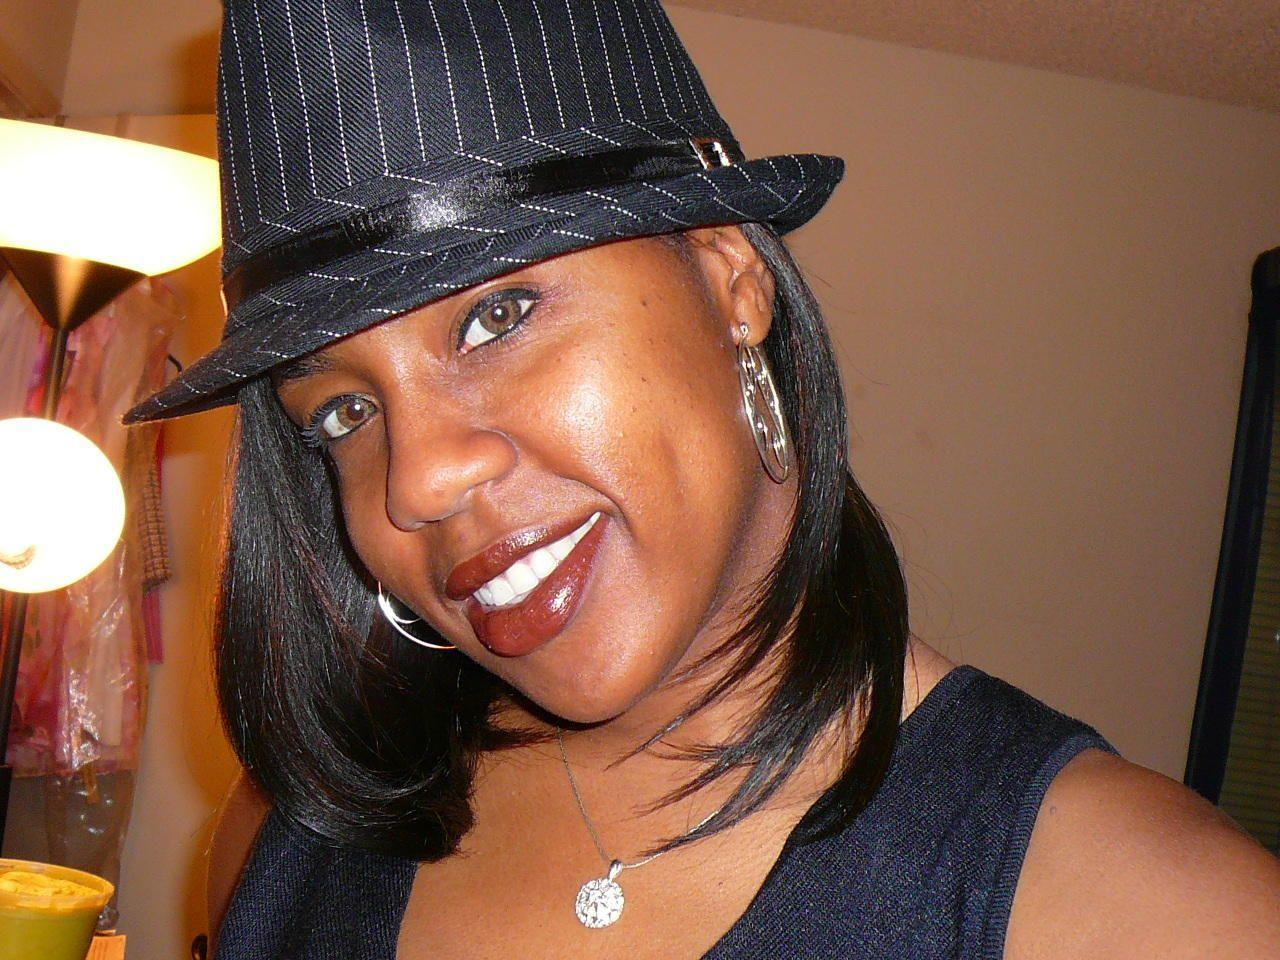 Ebony girlfriend pics